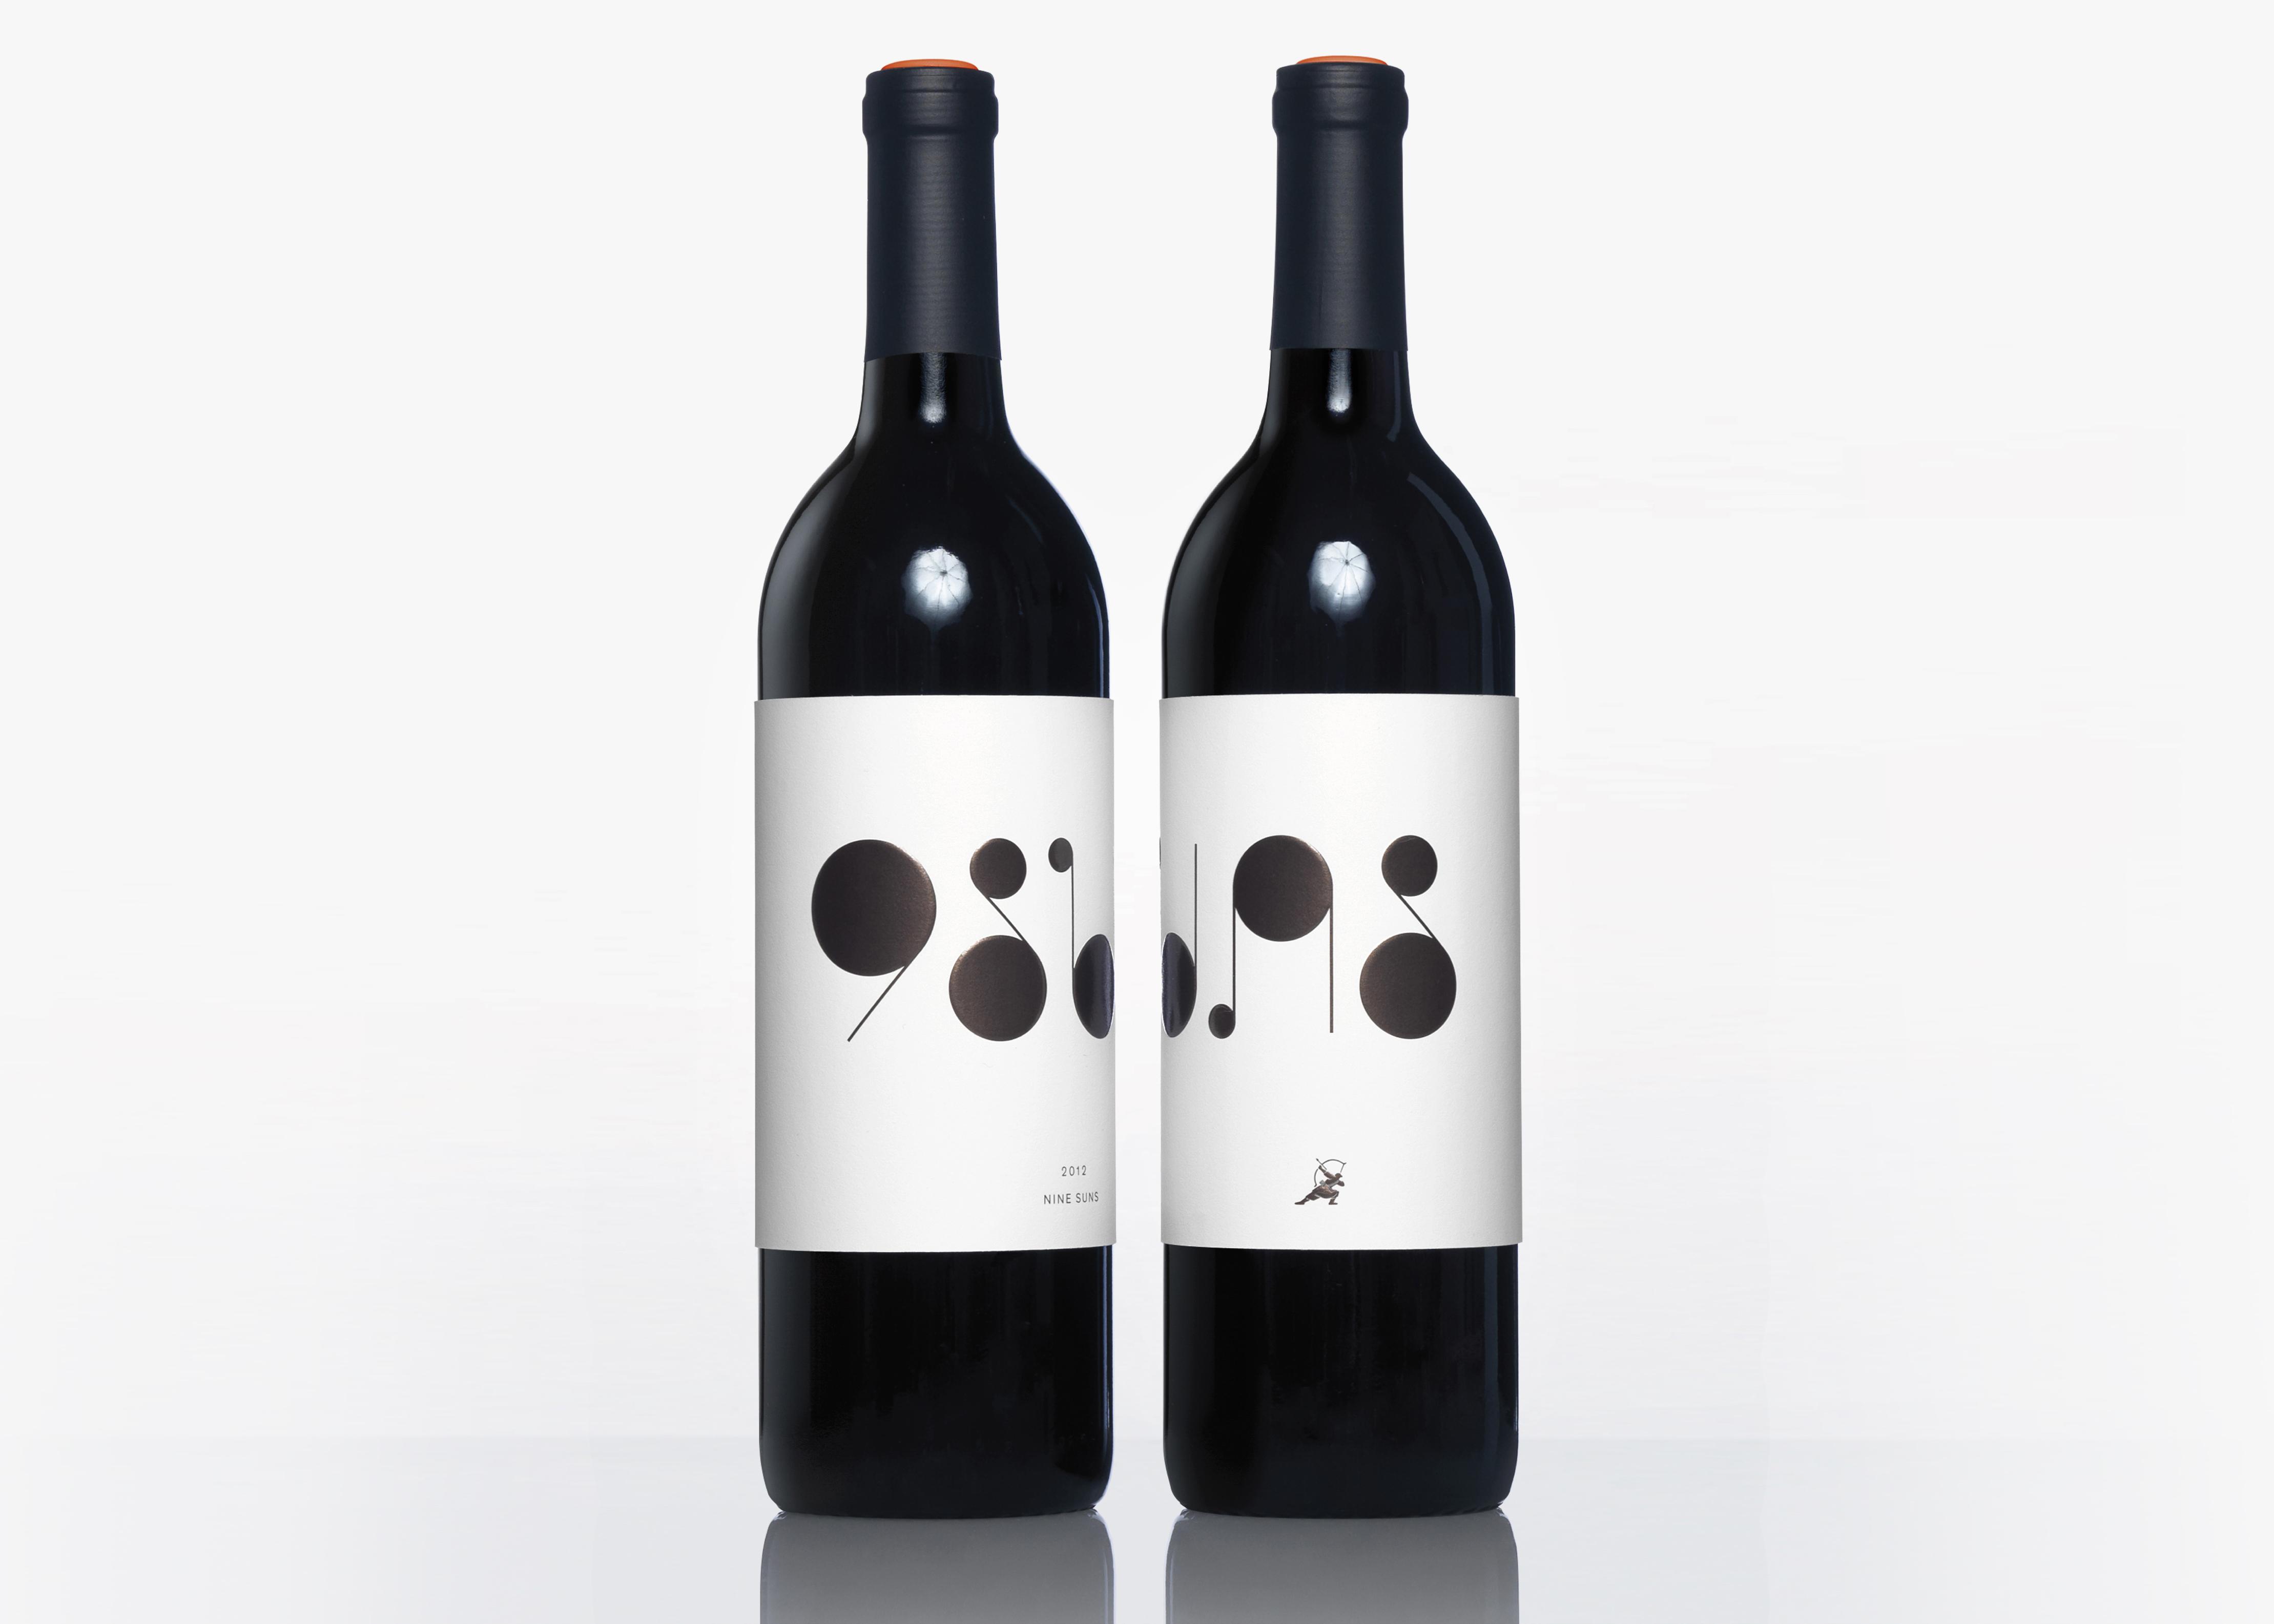 NineSuns_Bottle